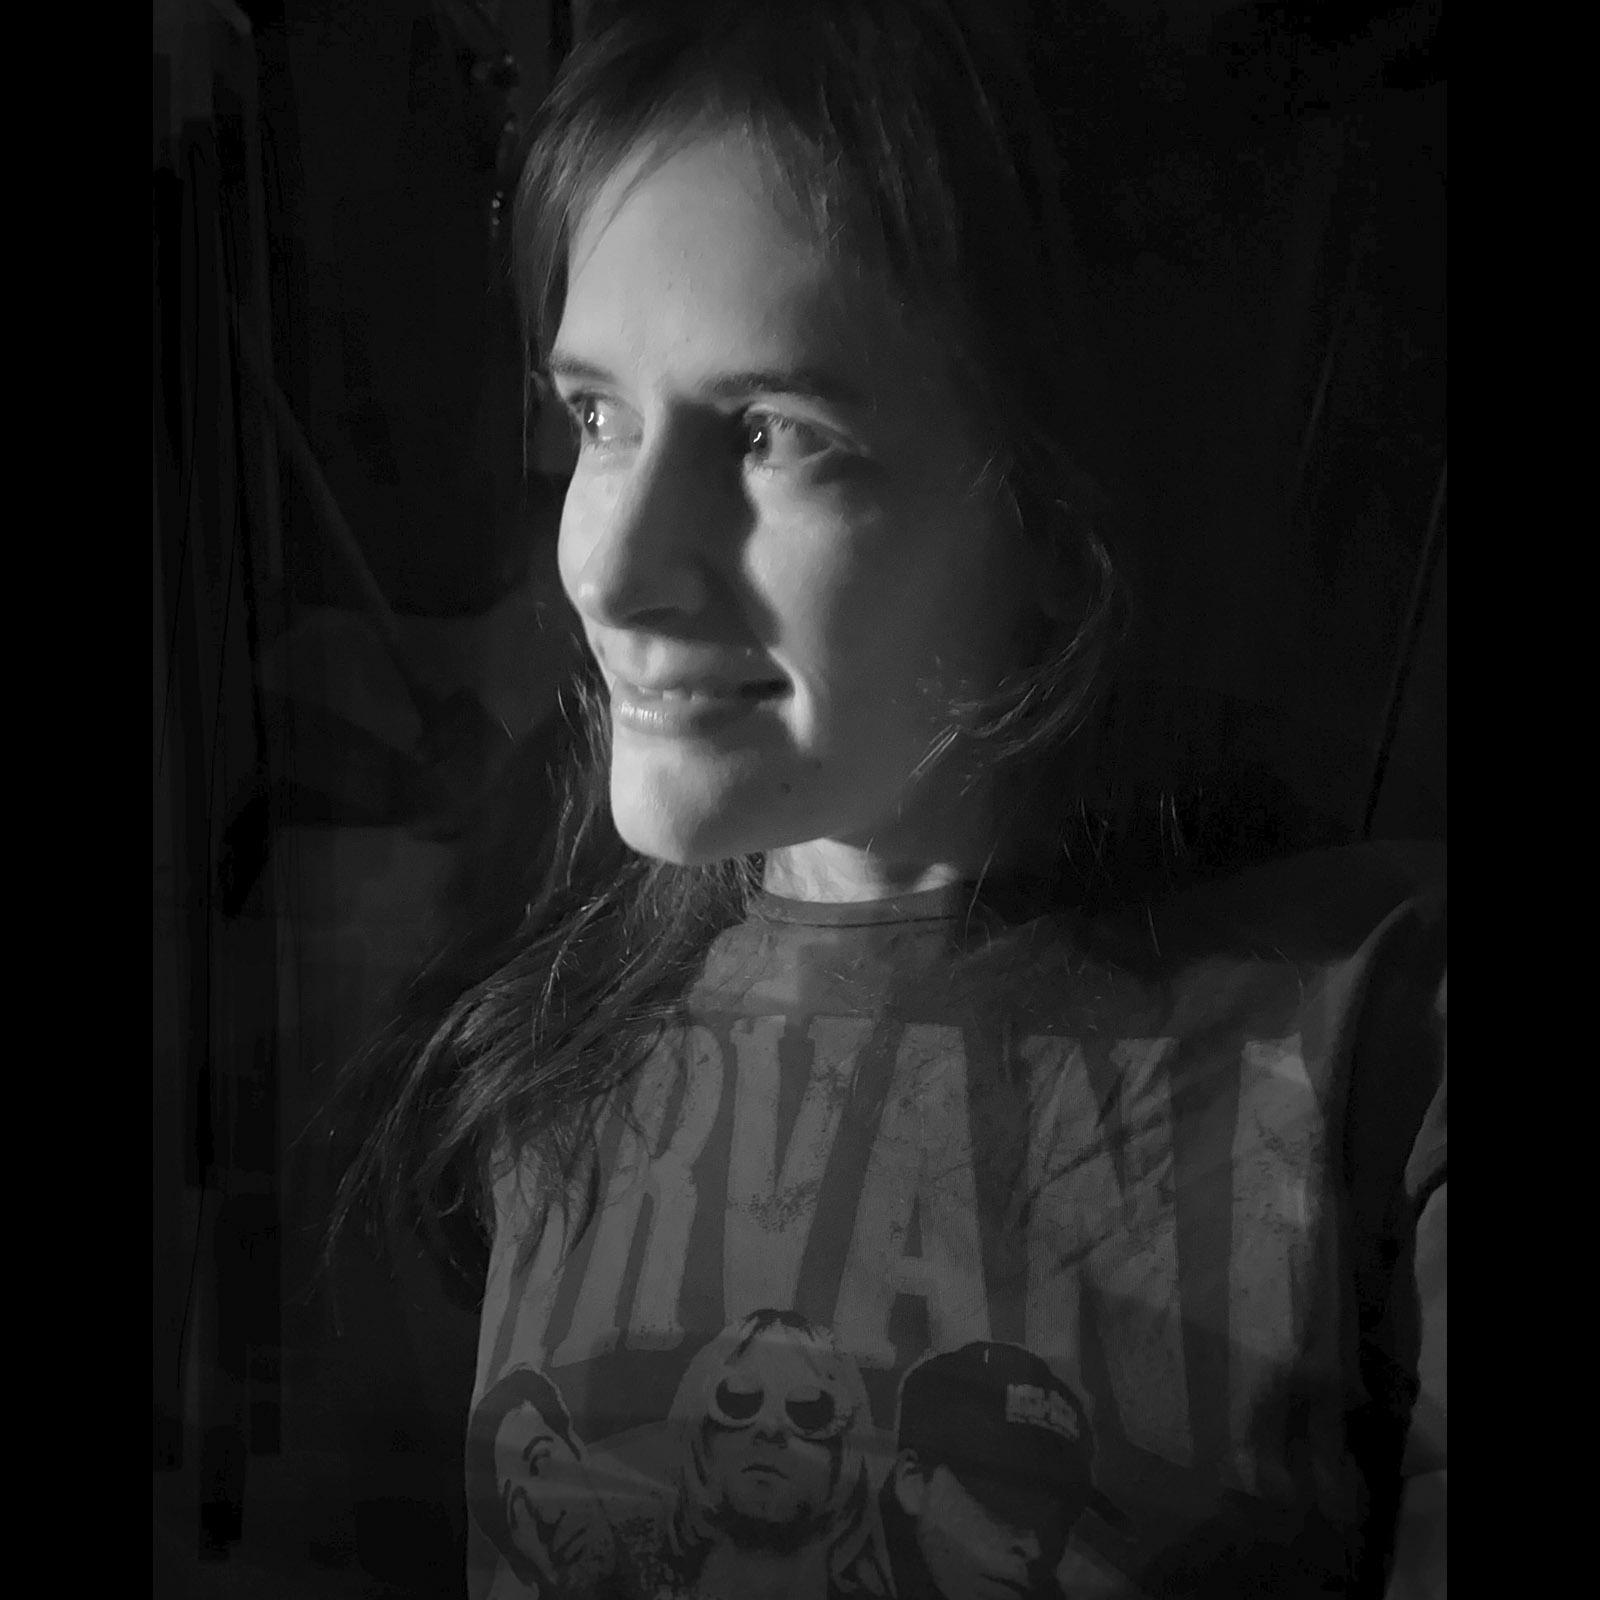 camila-agudelo-portrait